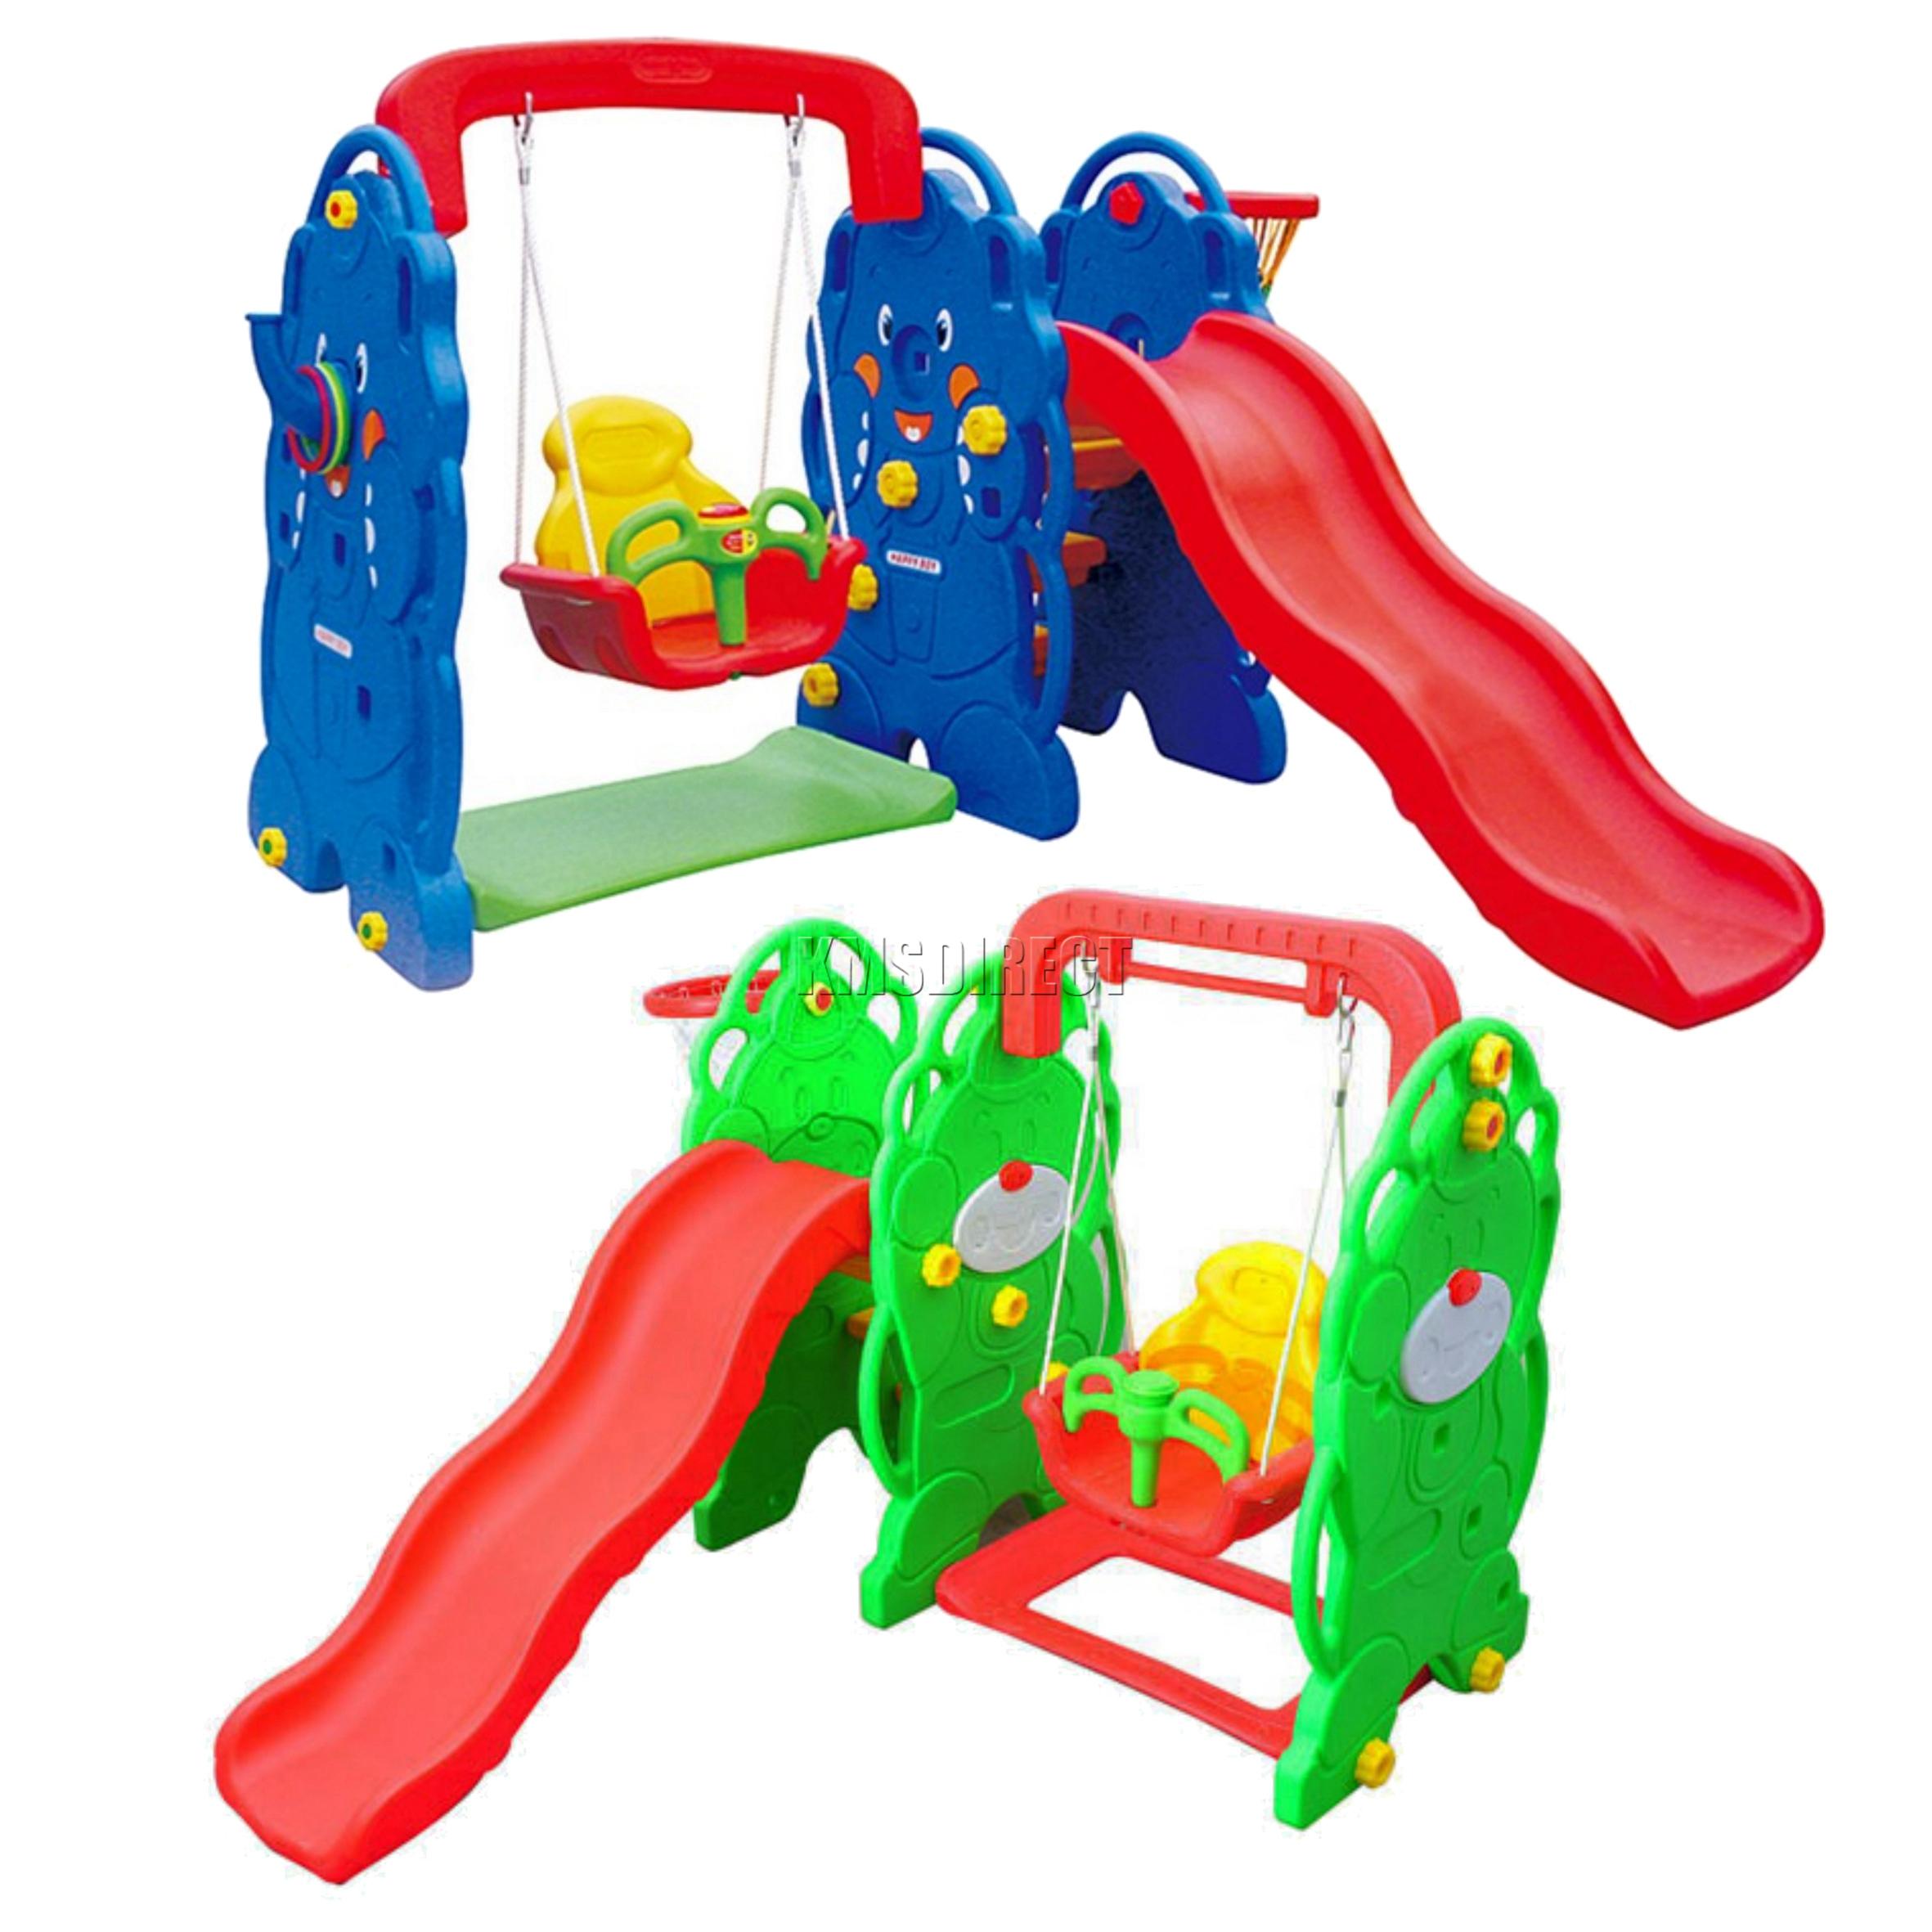 FoxHunter Kids Outdoor Playground Swing Slide Basketball Hoop